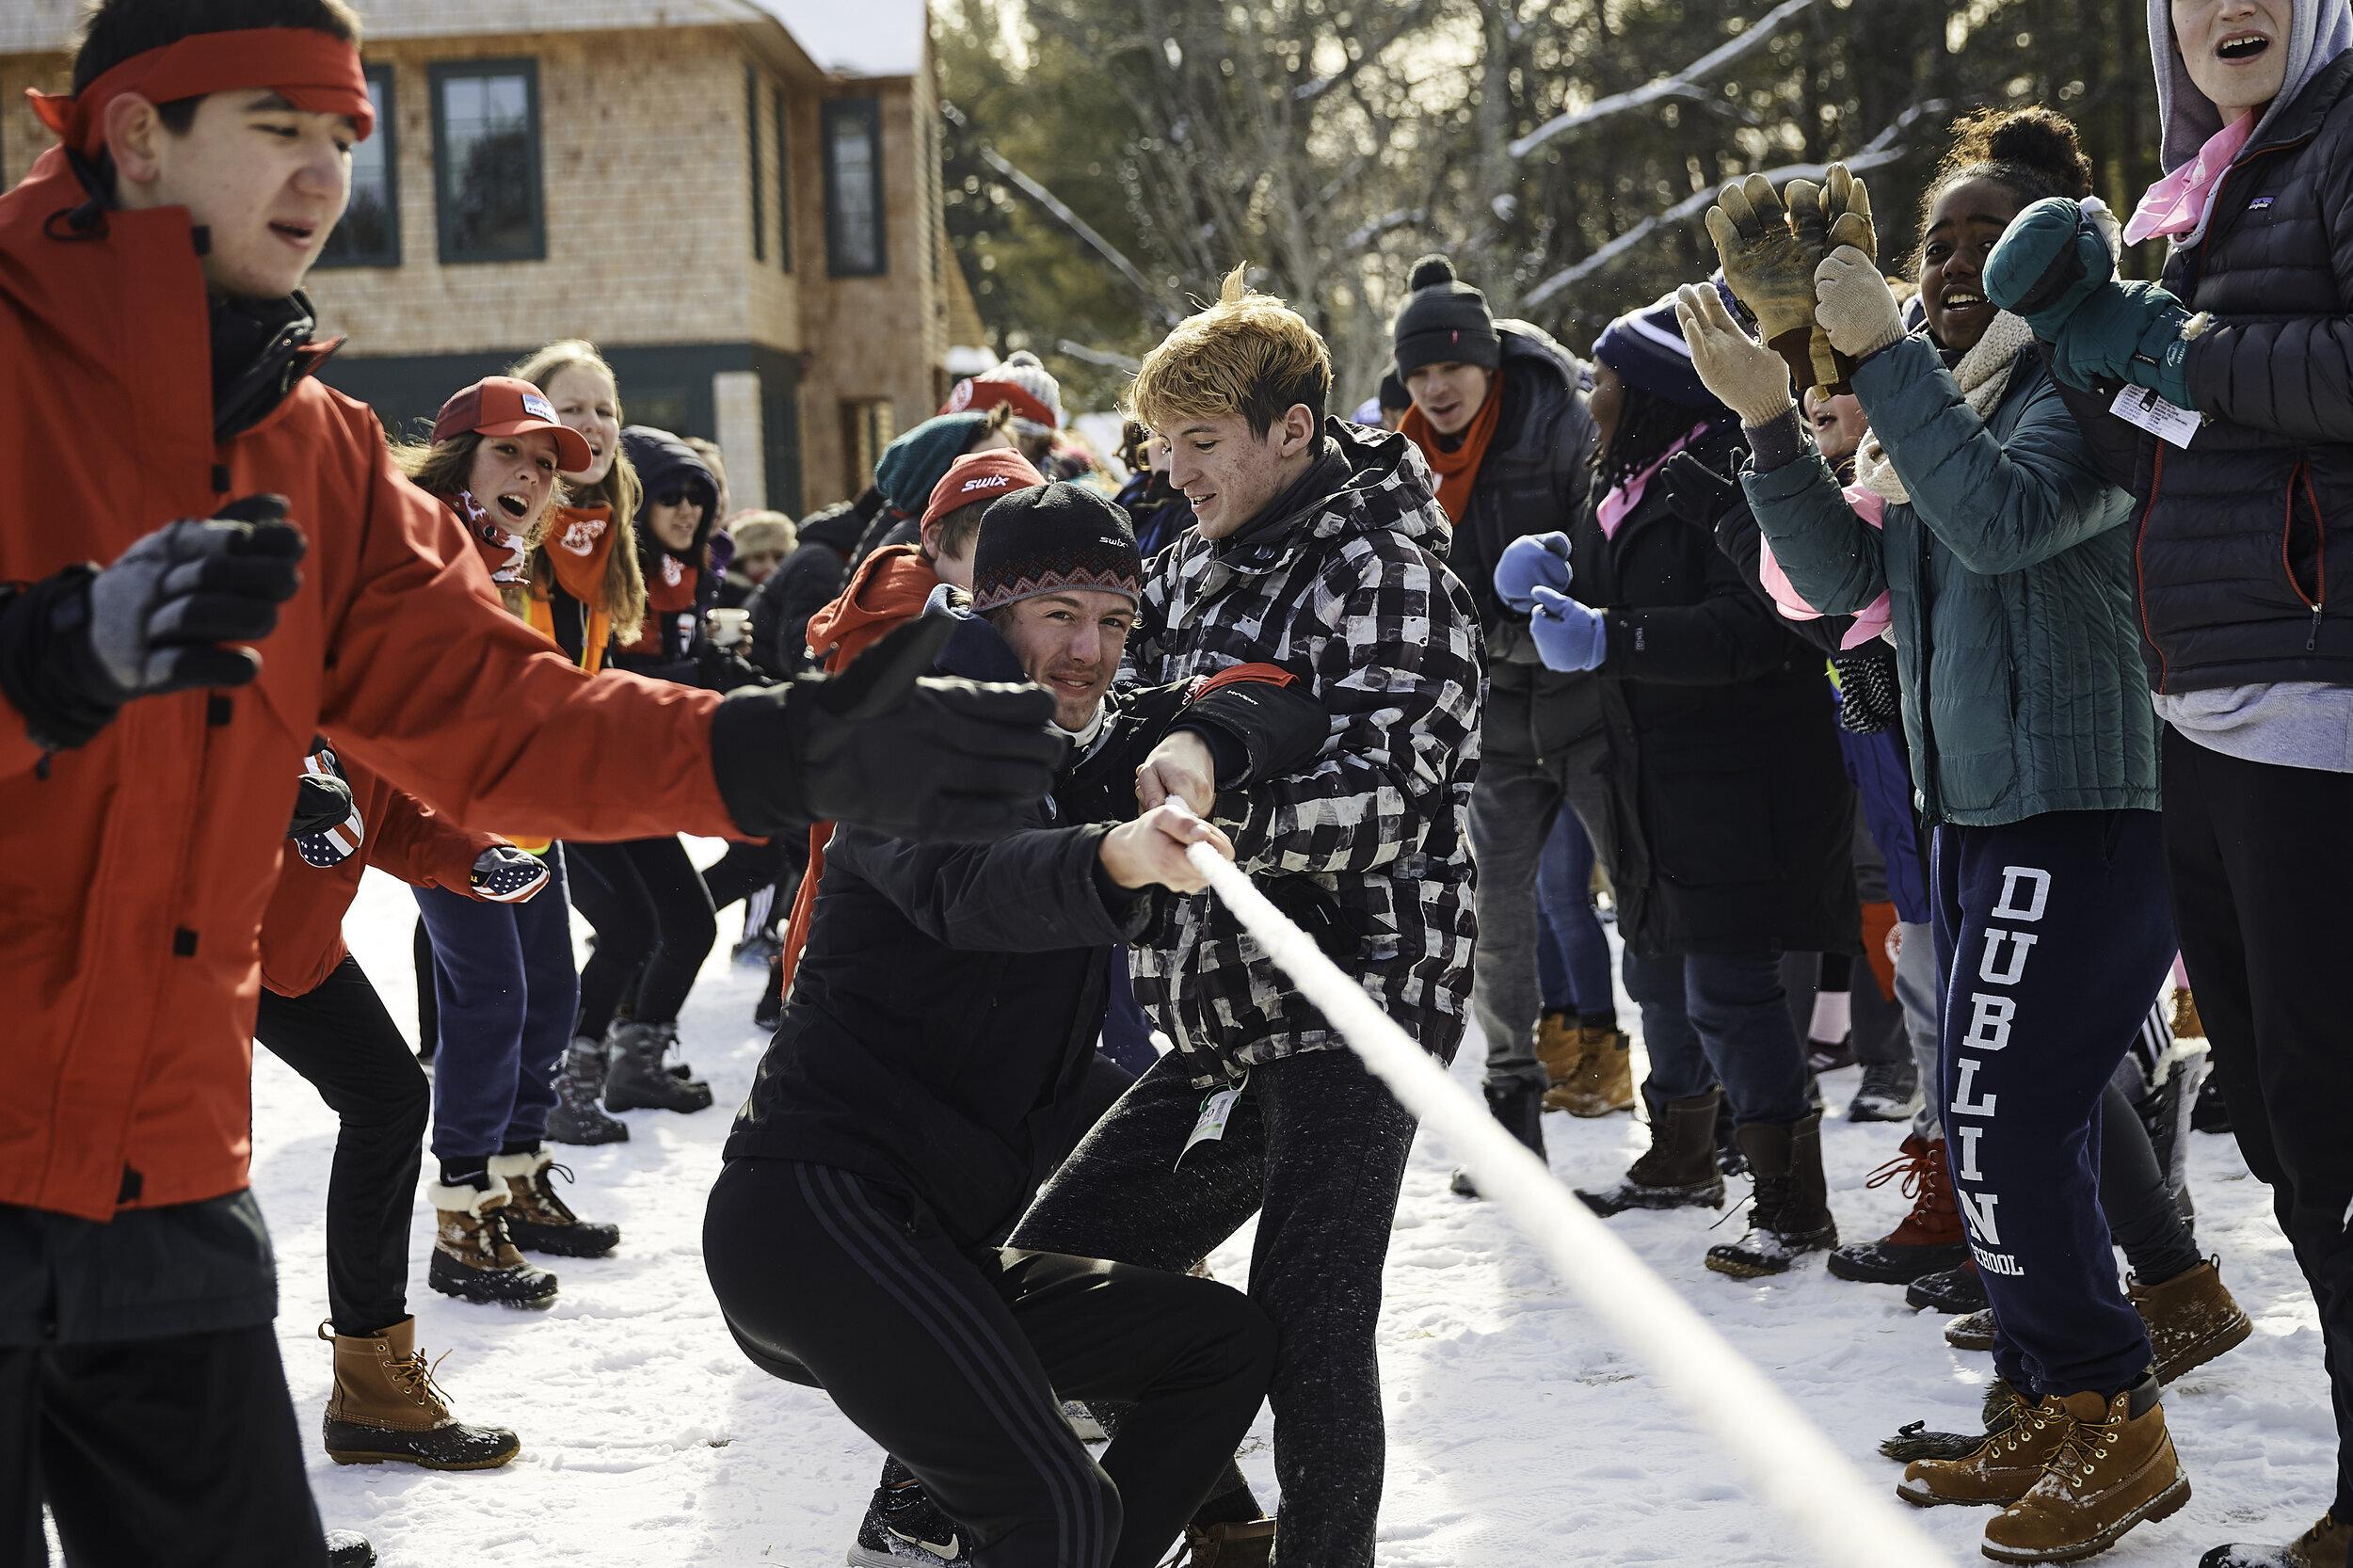 Winterfest - Games - Feb 02 2019 - 1866.jpg